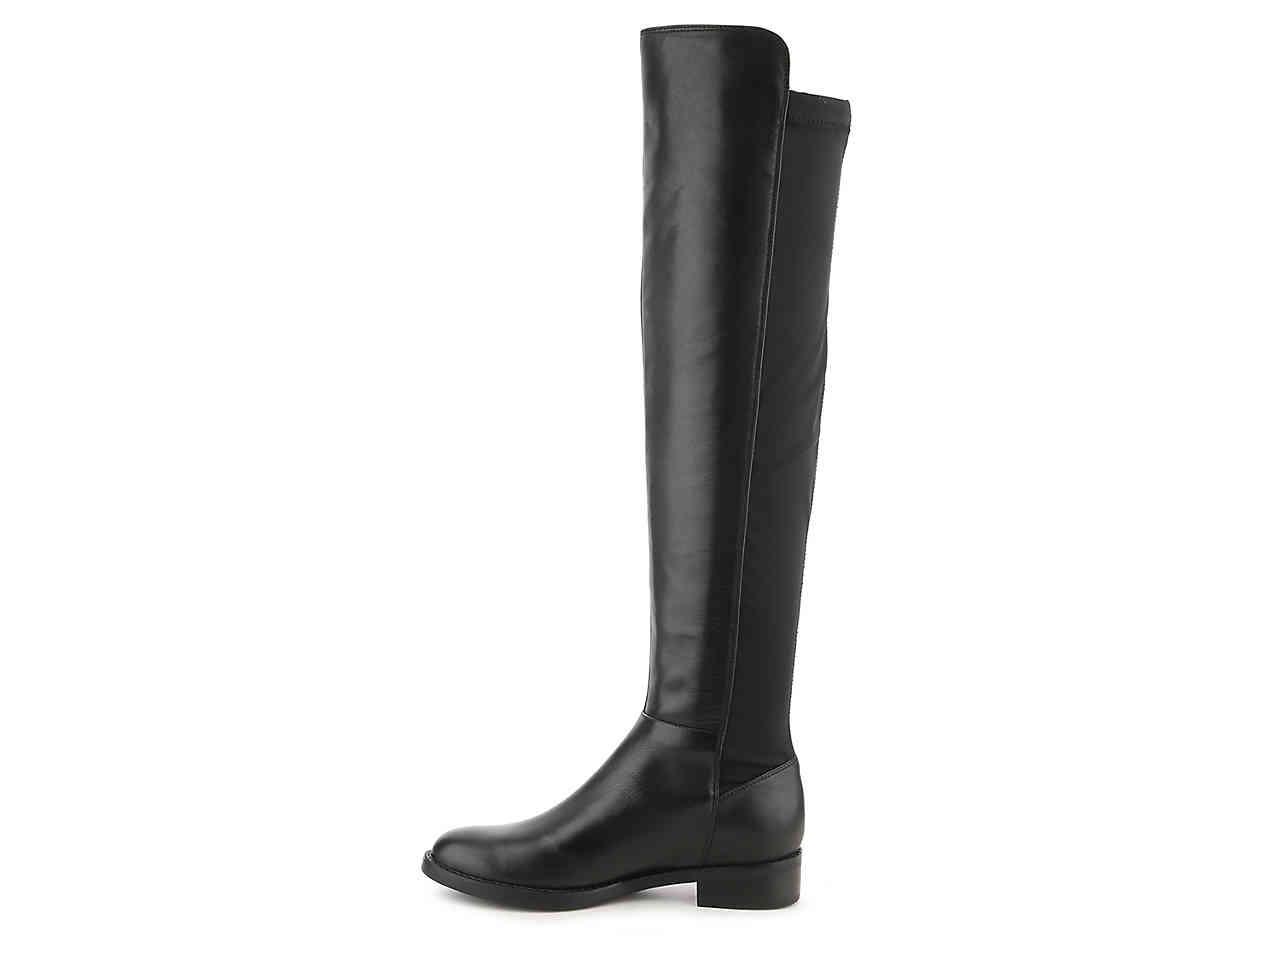 1ddaa368536 Lyst - Blondo Olivia Over The Knee Boot in Black